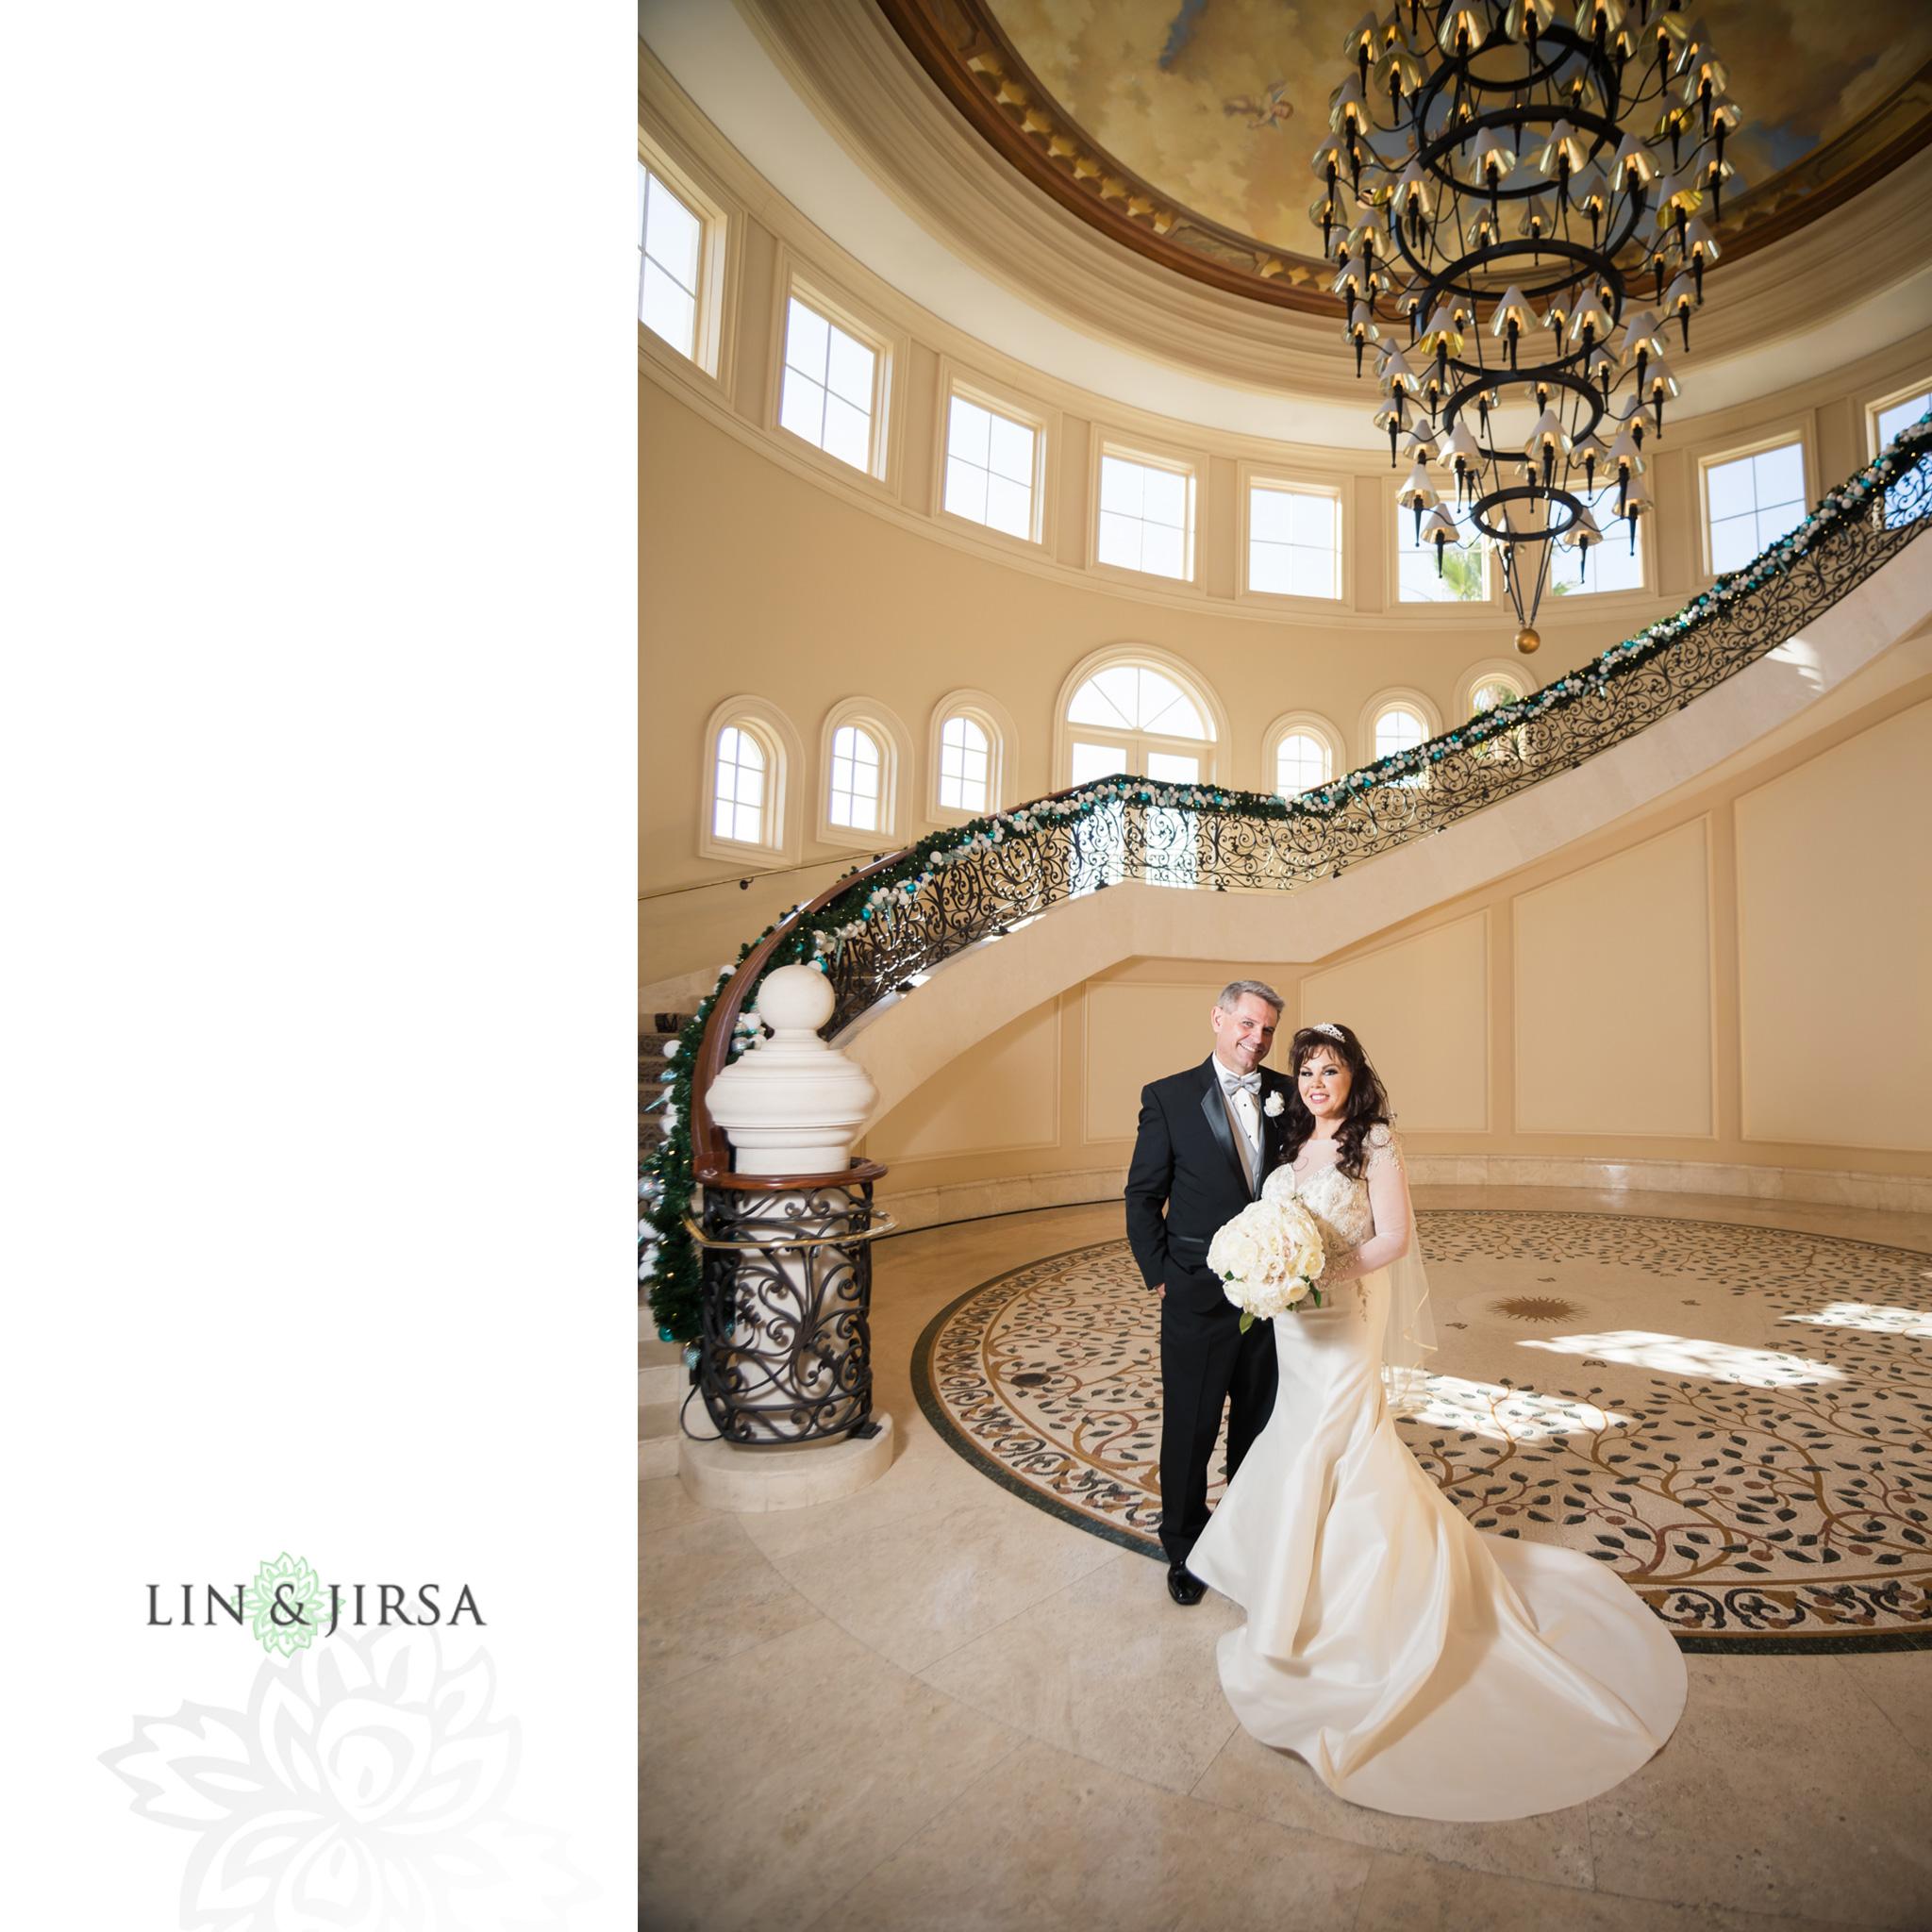 06-wish-upon-a-wedding-monarch-beach-resort-wedding-photography